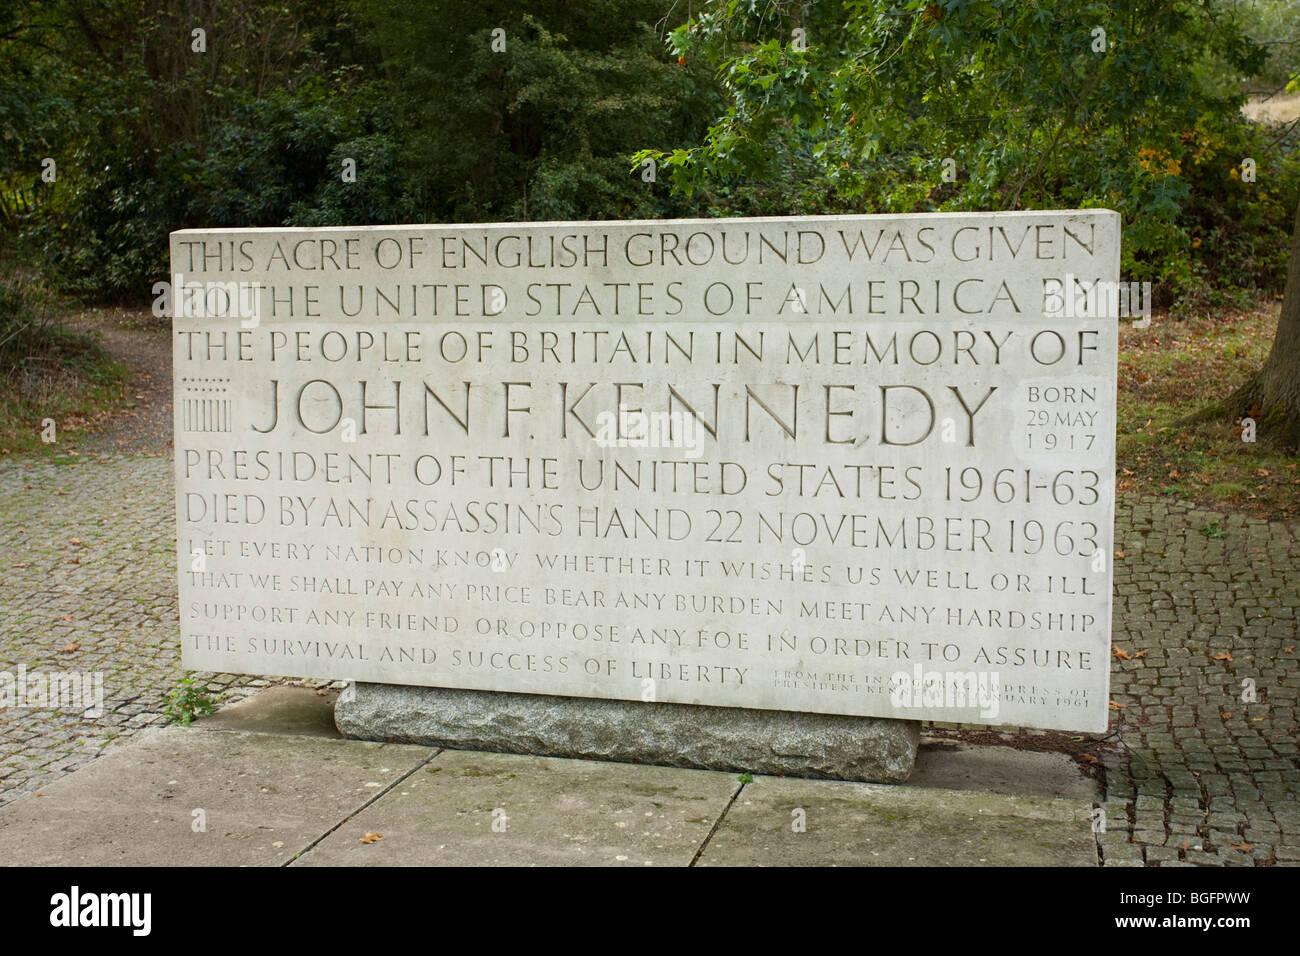 Kennedy Memorial, Runnymede, Berkshire - Stock Image